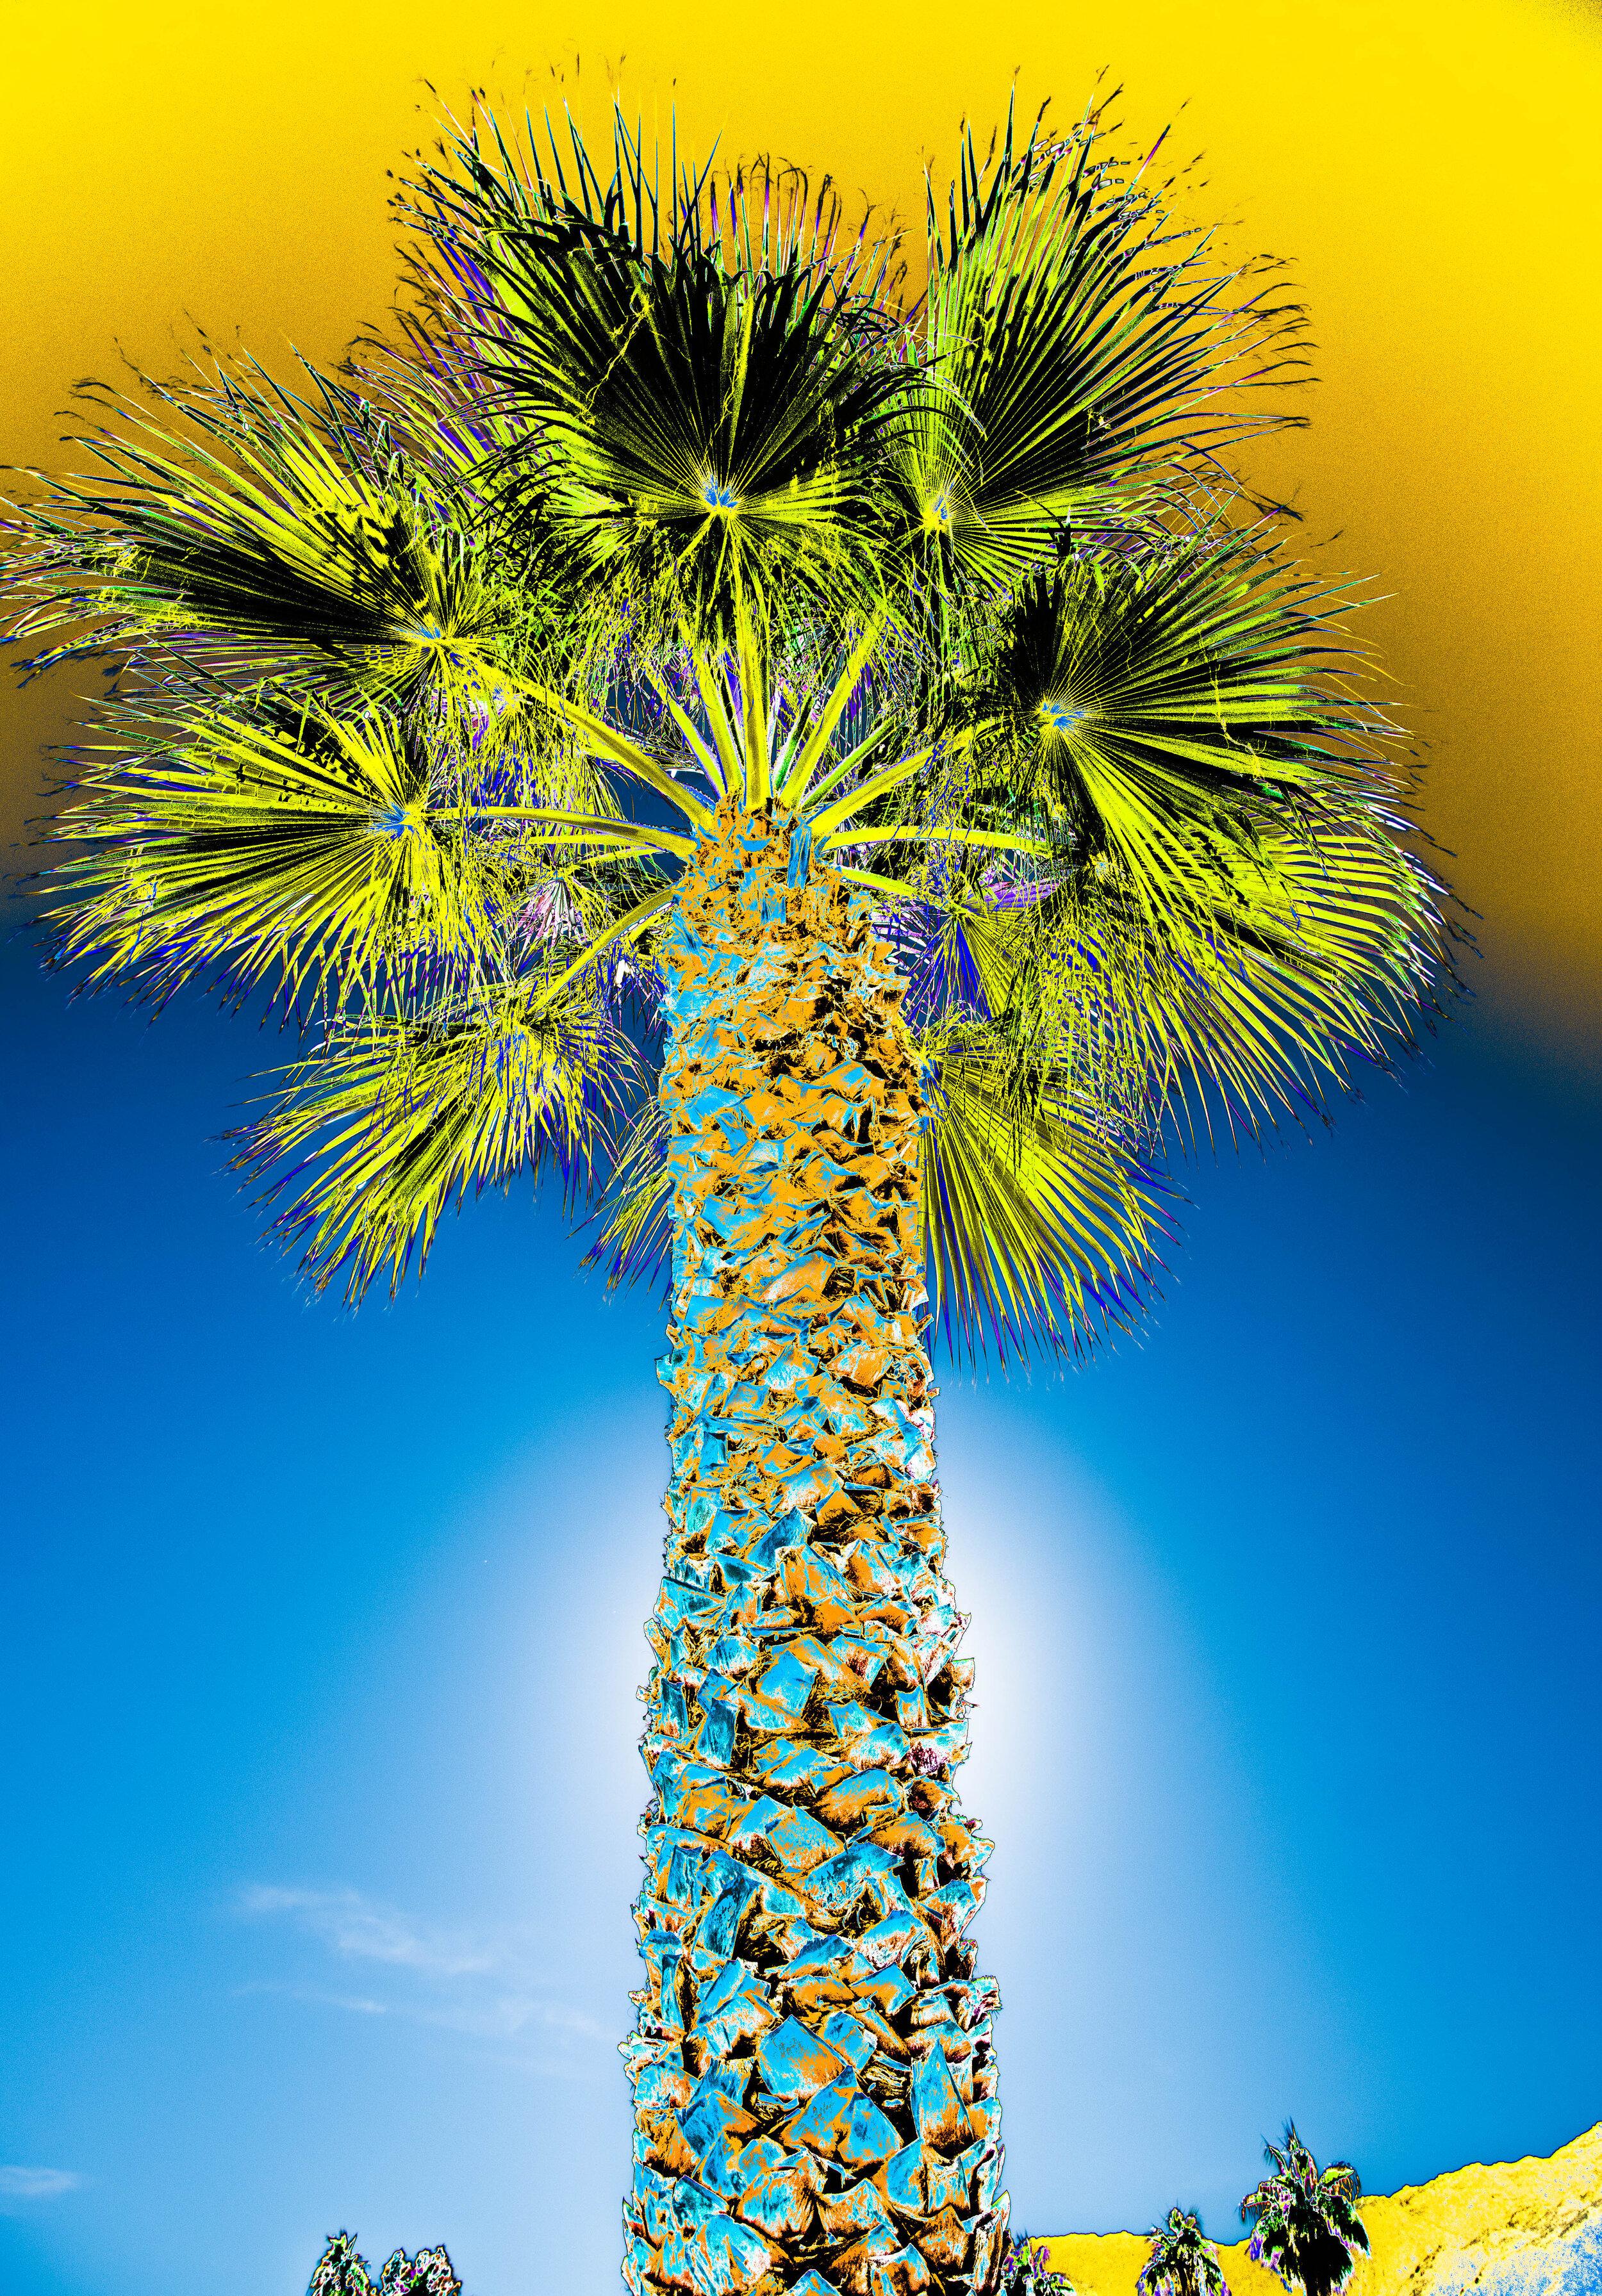 Tall Palm Yellow/Blue Sky